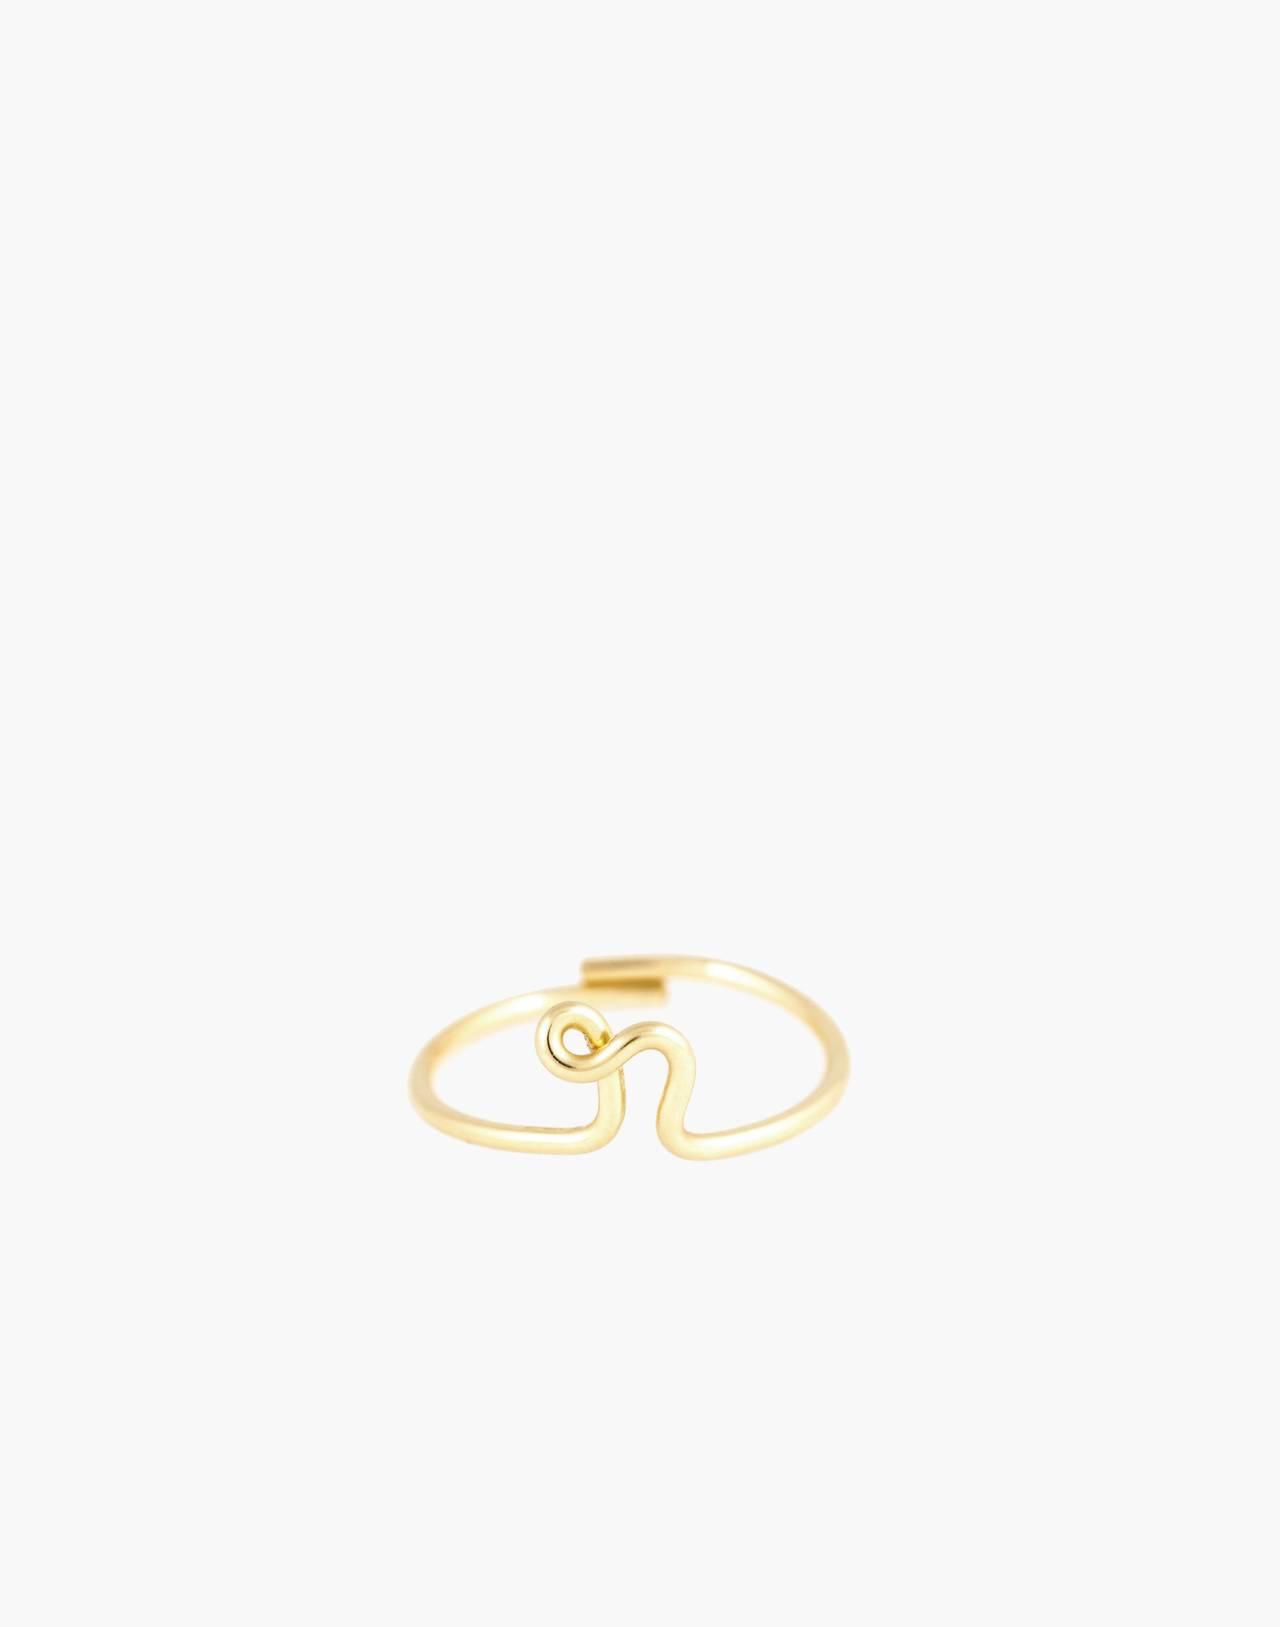 Atelier Paulin™ Poetic Letter Ring in letter r image 1